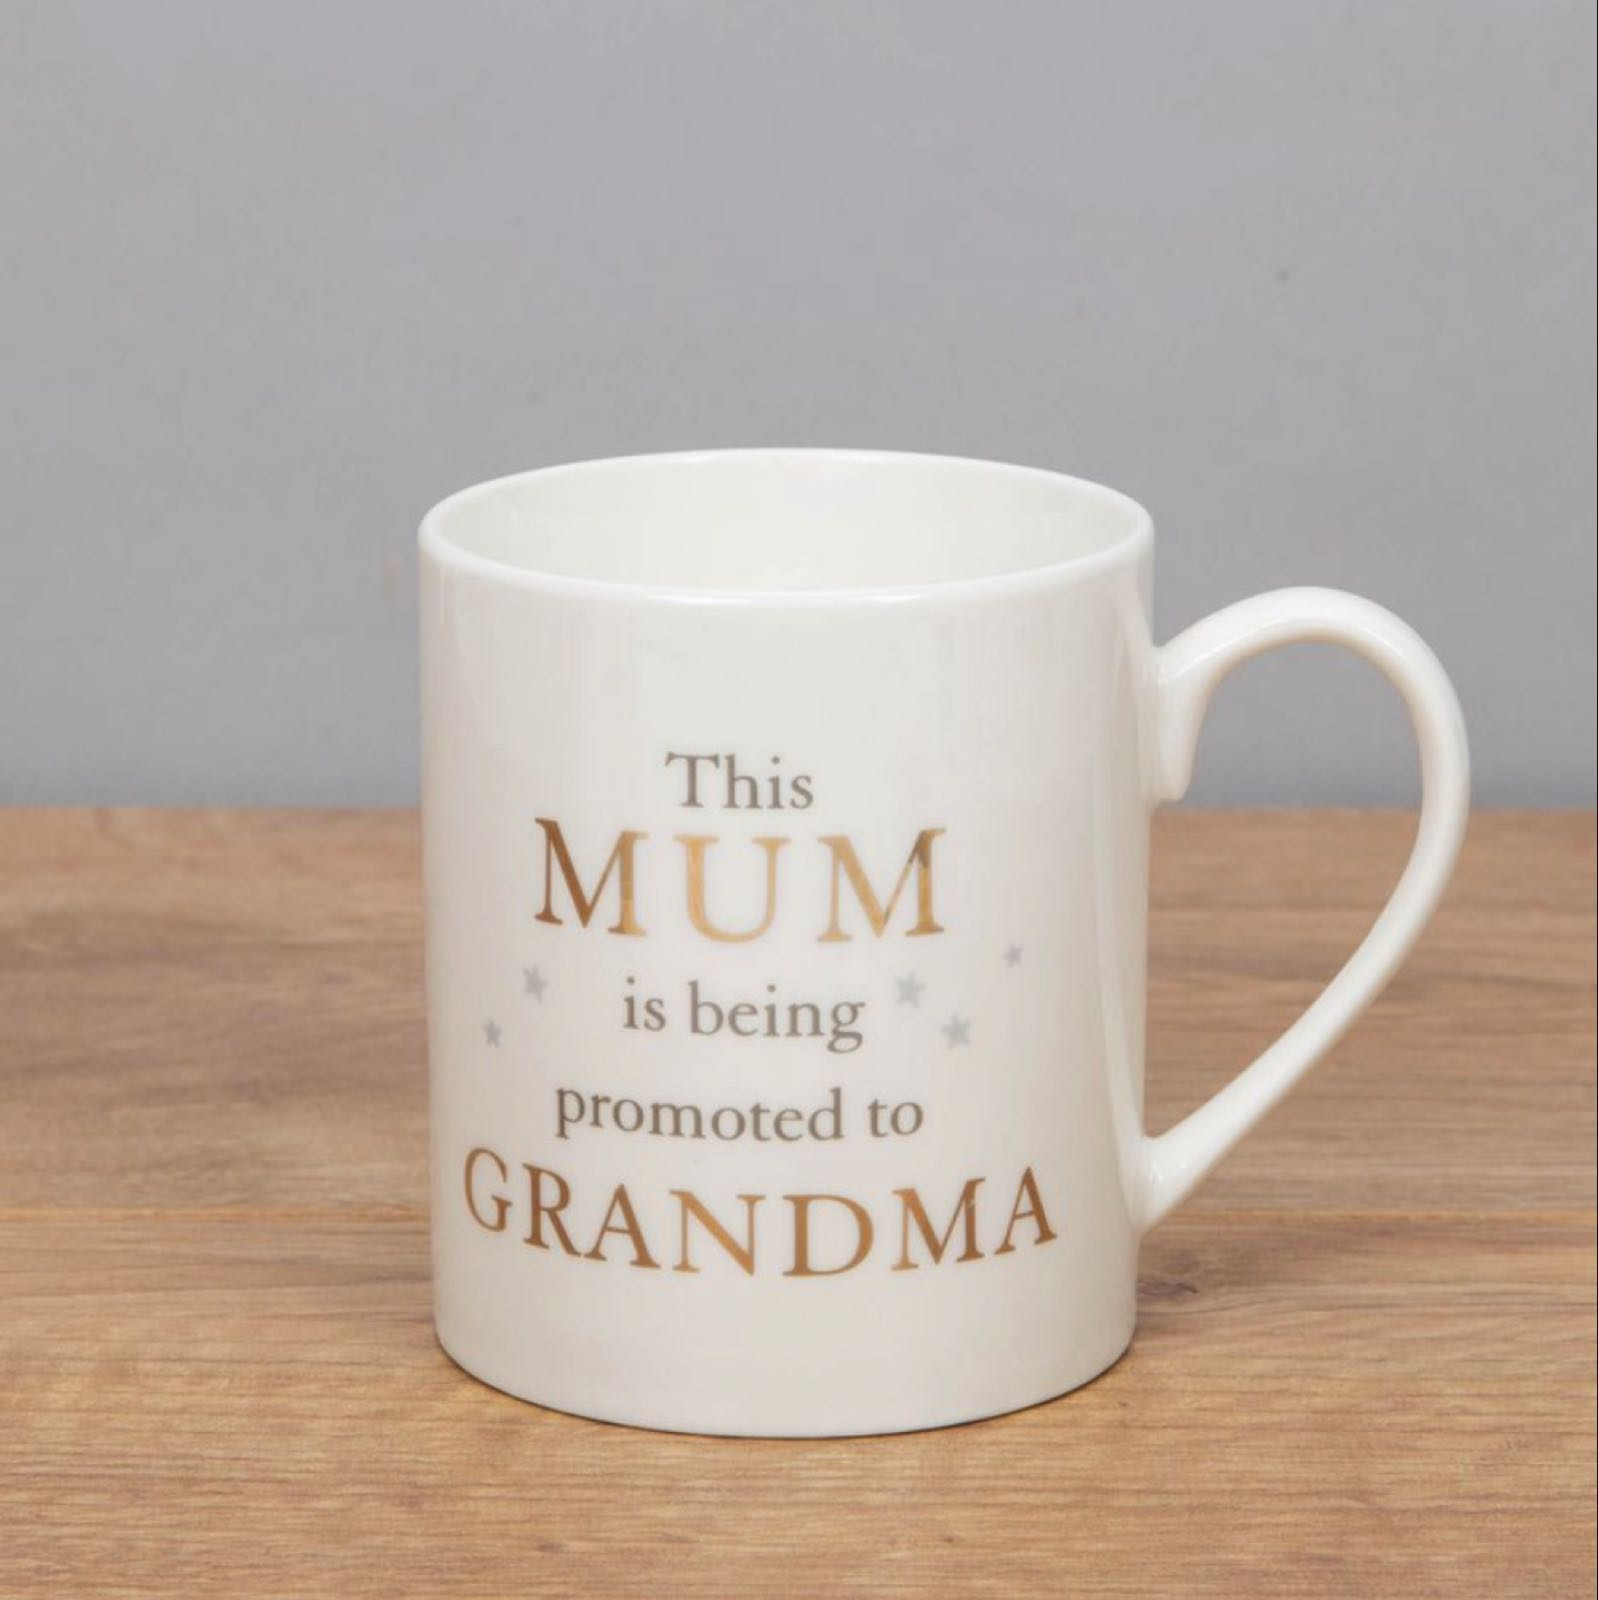 Mum Promoted to Grandma Bone China Mug